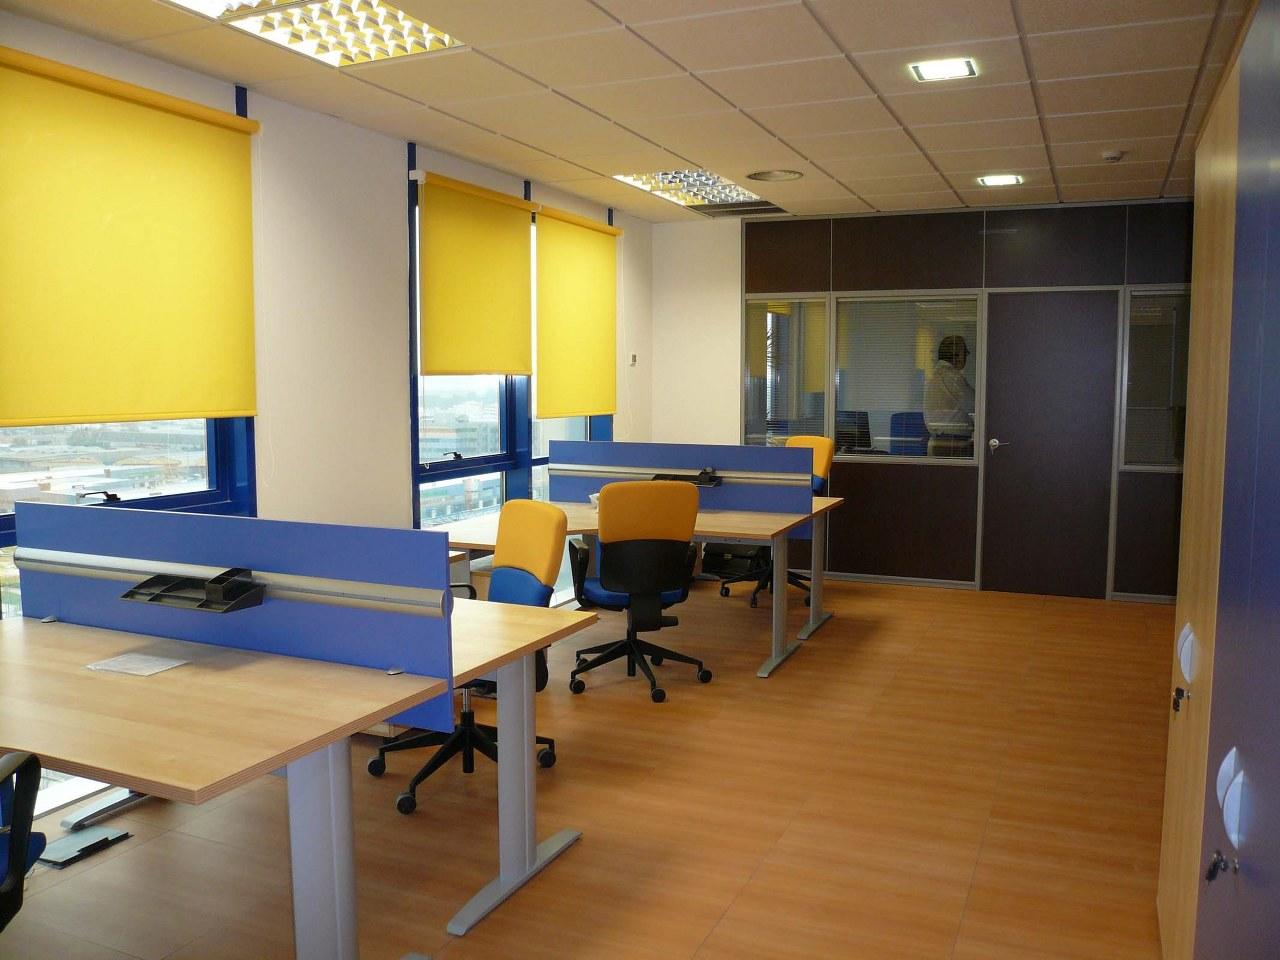 Sevilla oficinas proleit ac2bcn estudio de arquitectura interior - Estudios de arquitectura sevilla ...